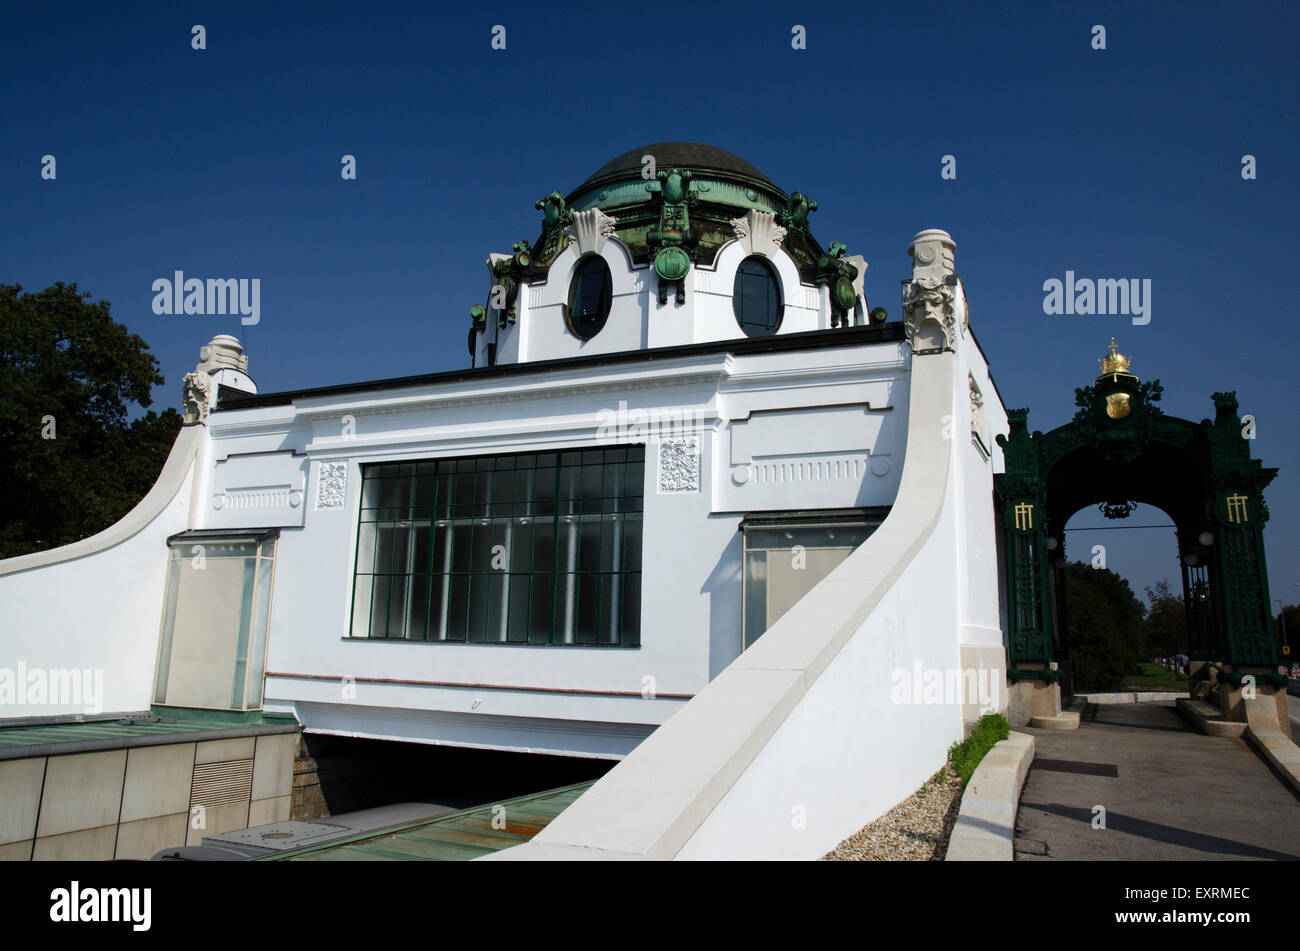 U4 hietzing u bahn station kaiser pavilion vienna austria - Stock Image